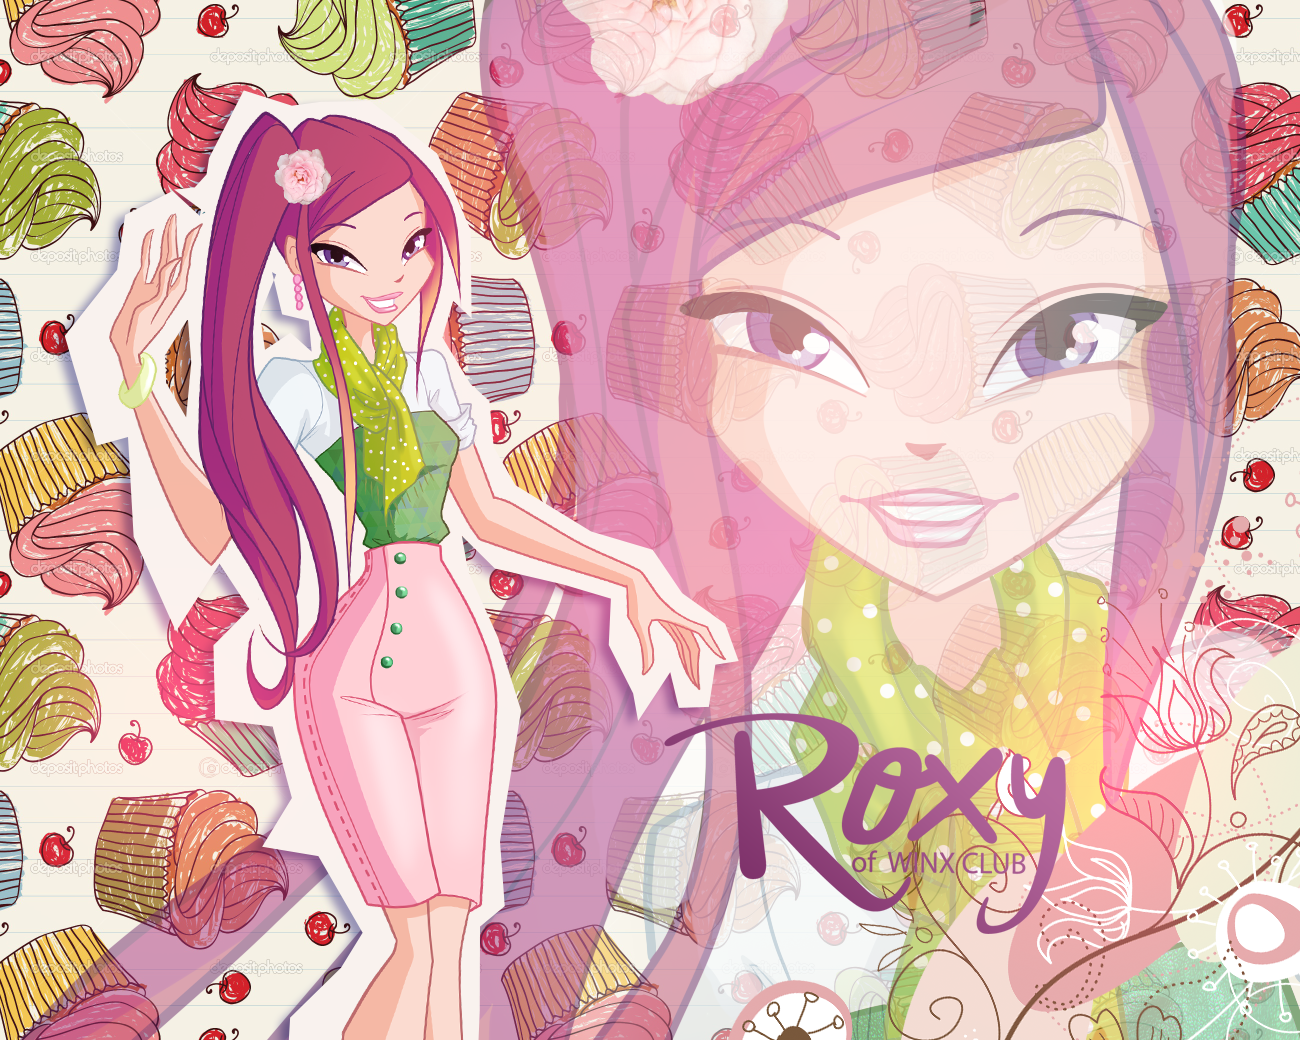 Winx Roxy 5 season wallpaper\Винкс рокси 5 сезон обои